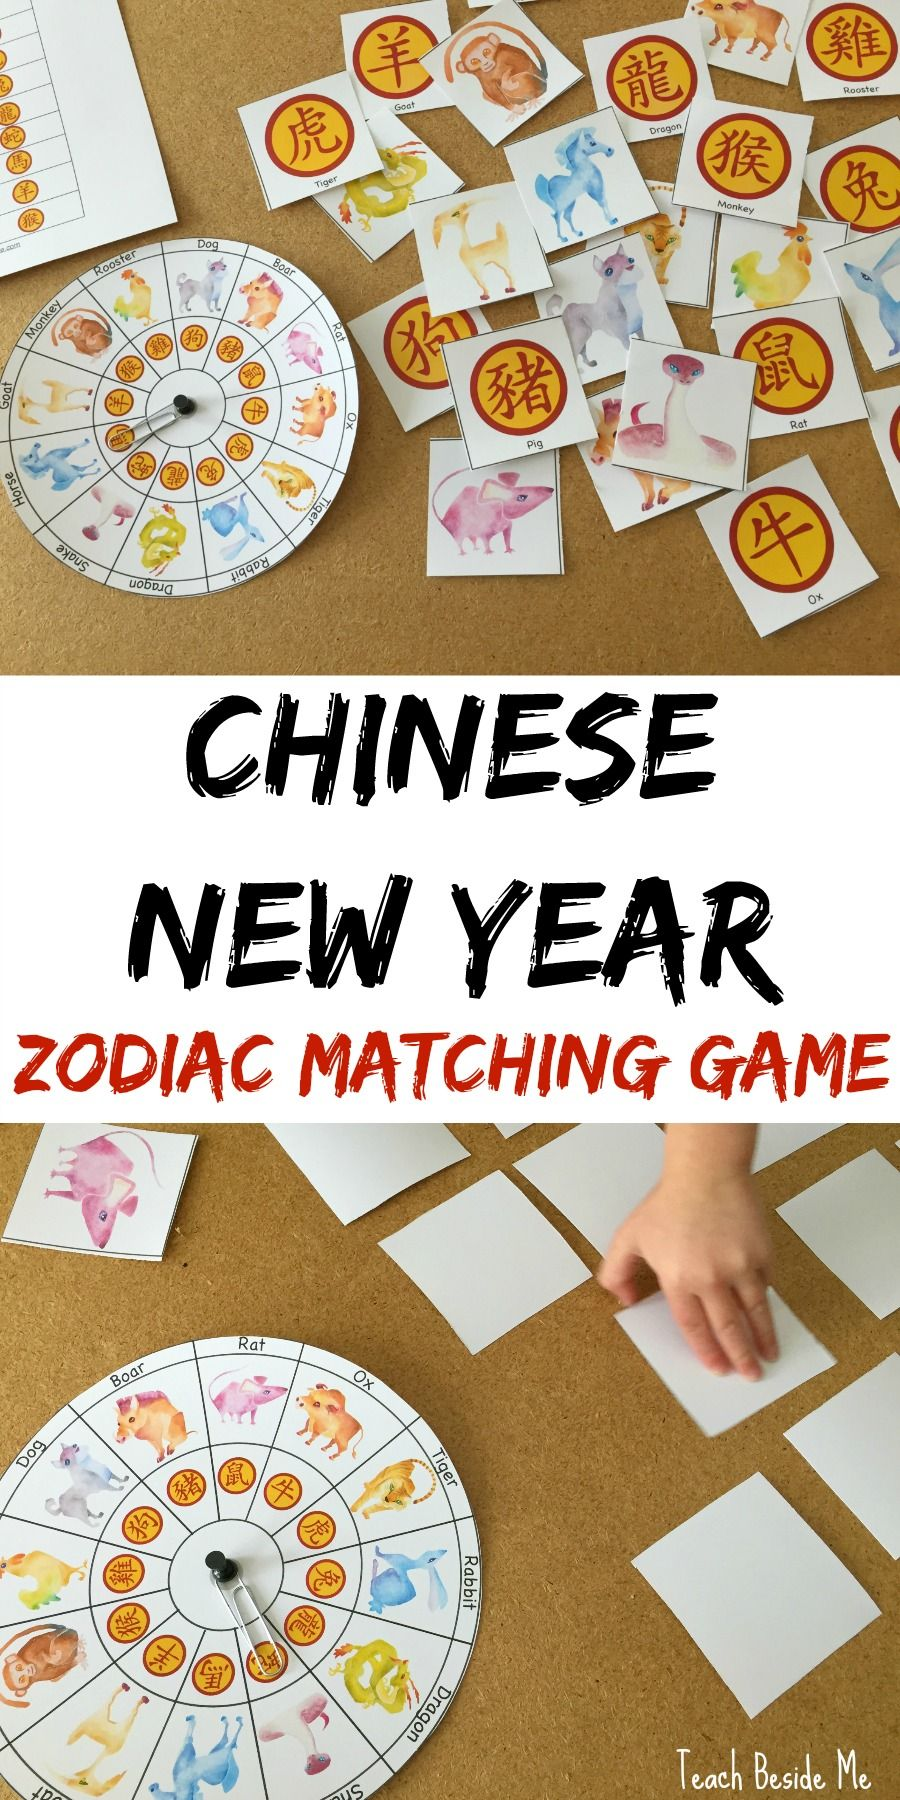 Chinese New Year Zodiac Matching Game Chinese new year